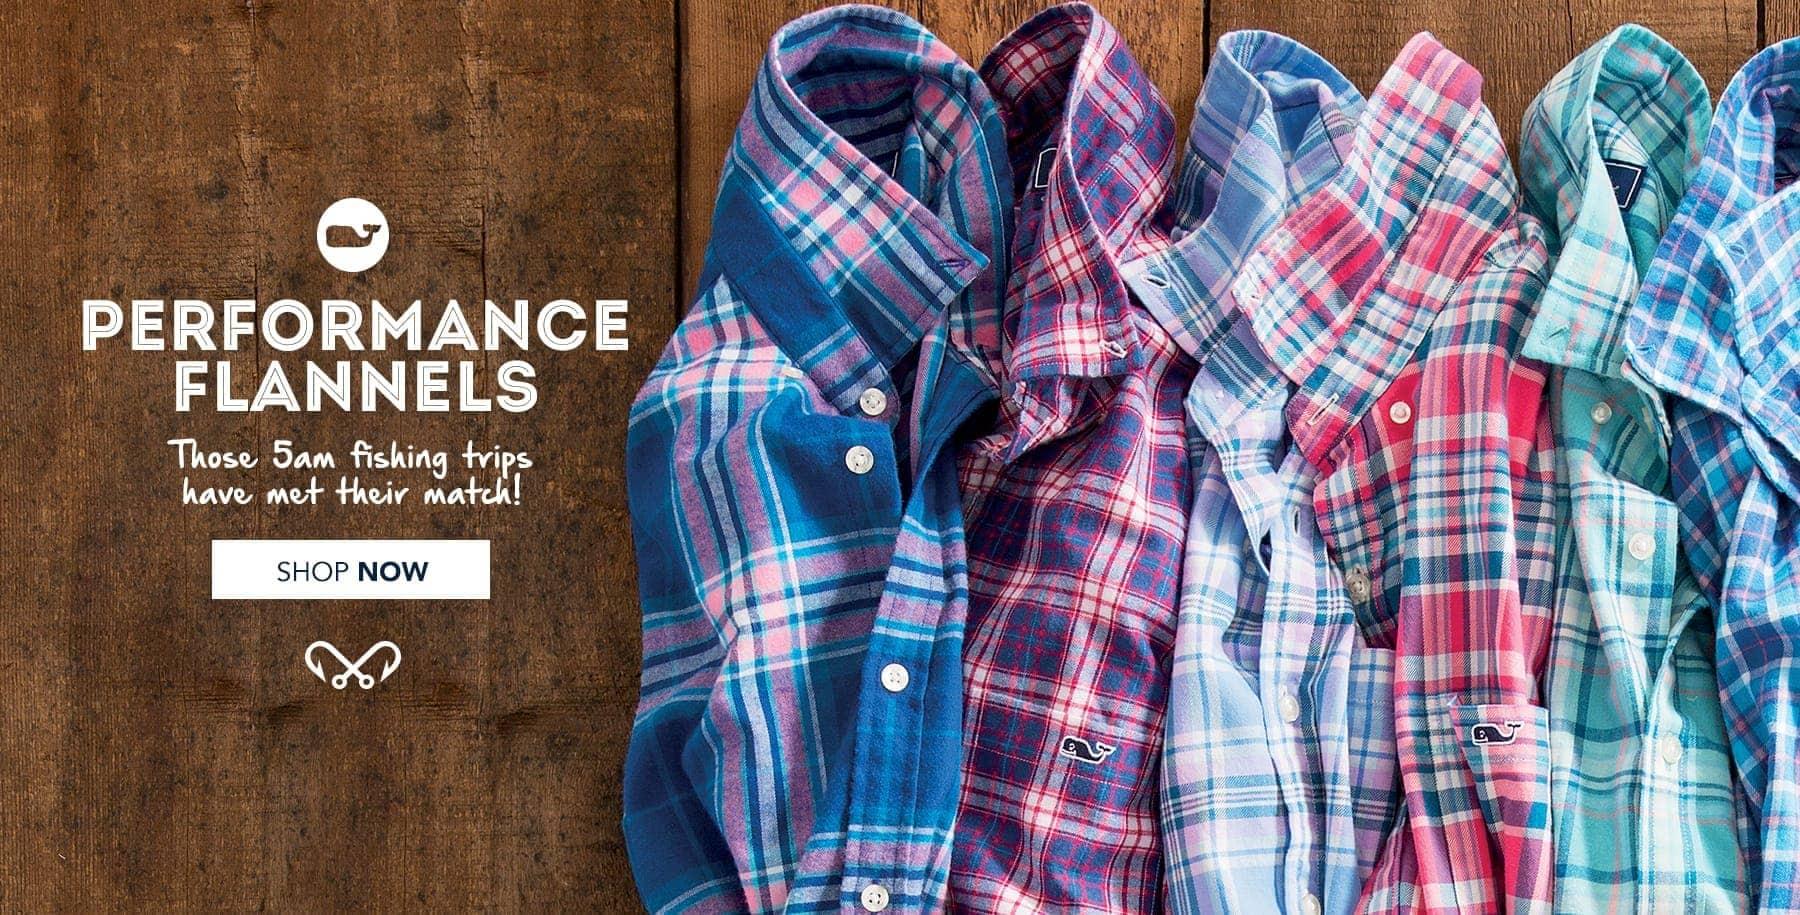 Performance Flannels. Those 5AM Fishing Trips Have Met Their Match. Shop Performance Flannels in Mens Performance Shop